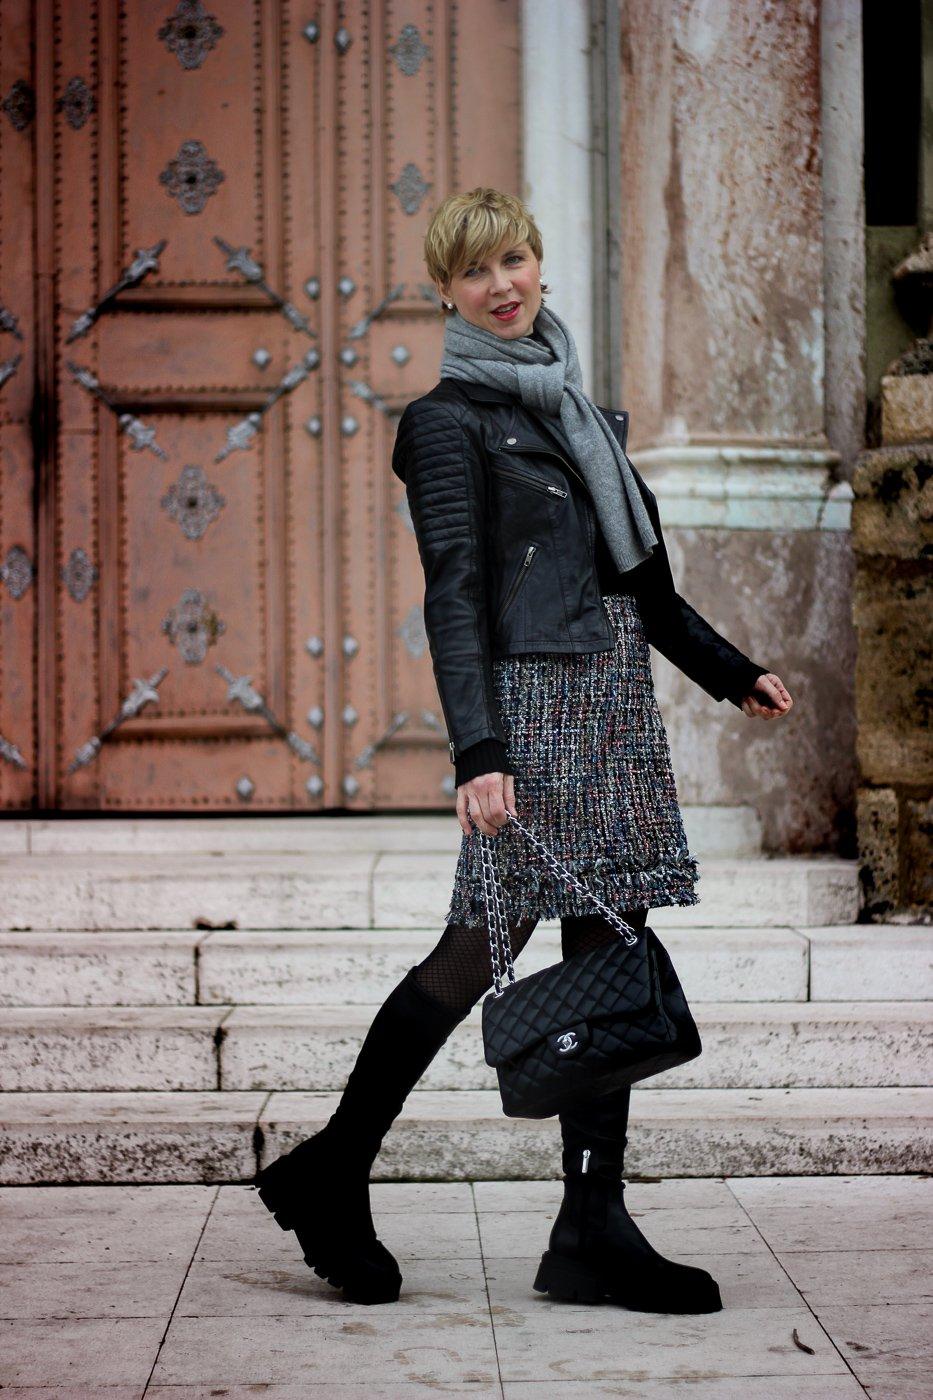 conny doll lifestyle: Bouclé-Rock im Stilmix... mit derben Boots und Lederjacke